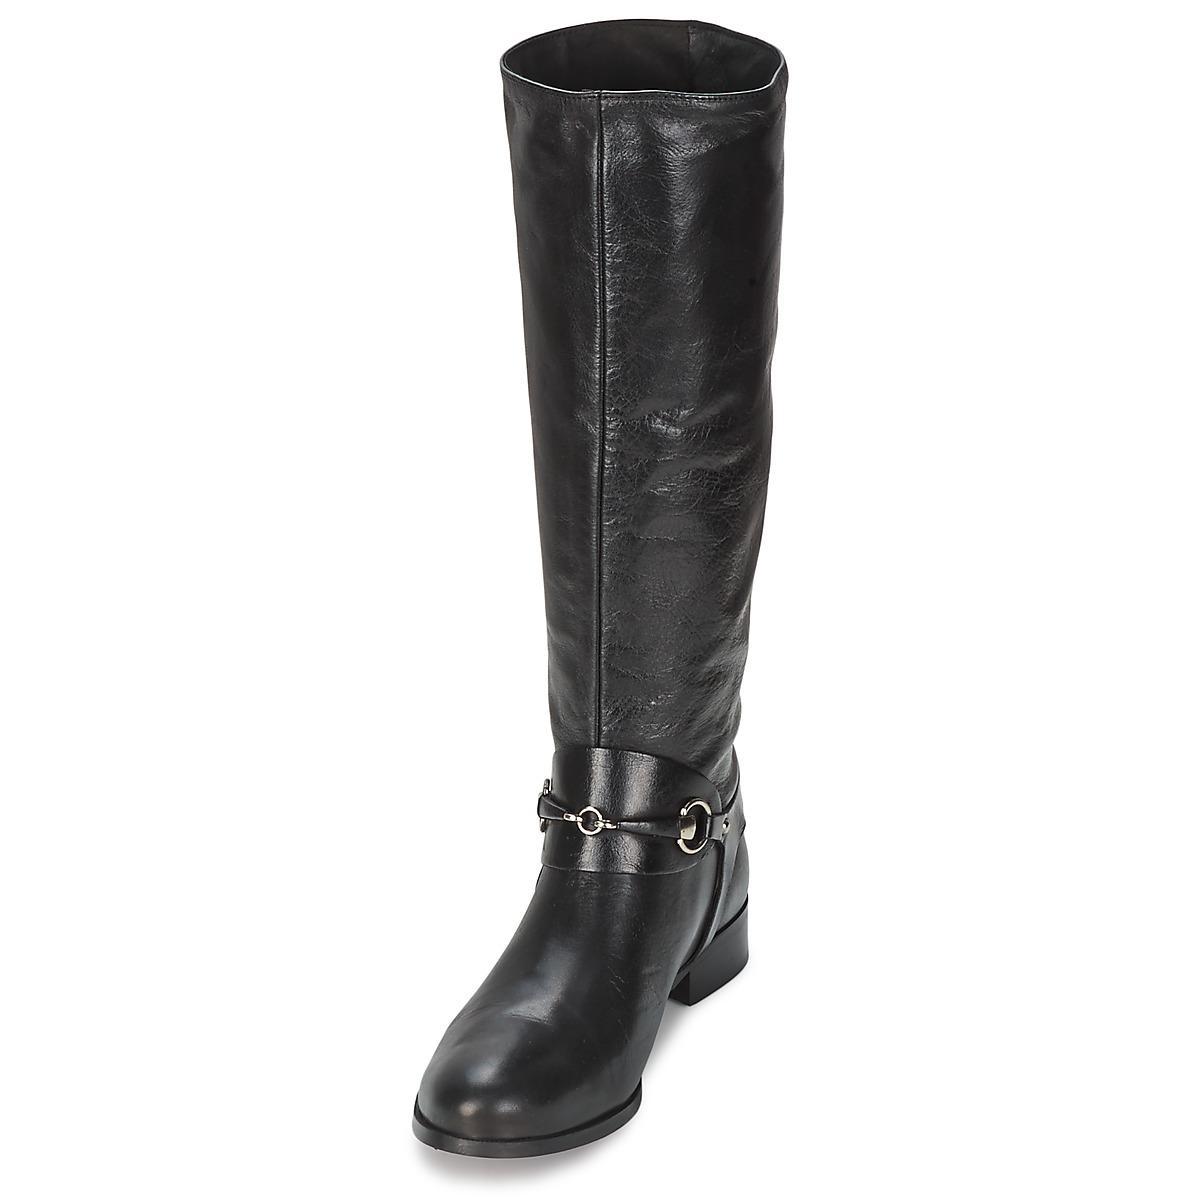 Betty London  Neivi Women's High Boots In Black  Lyst  View Fullscreen